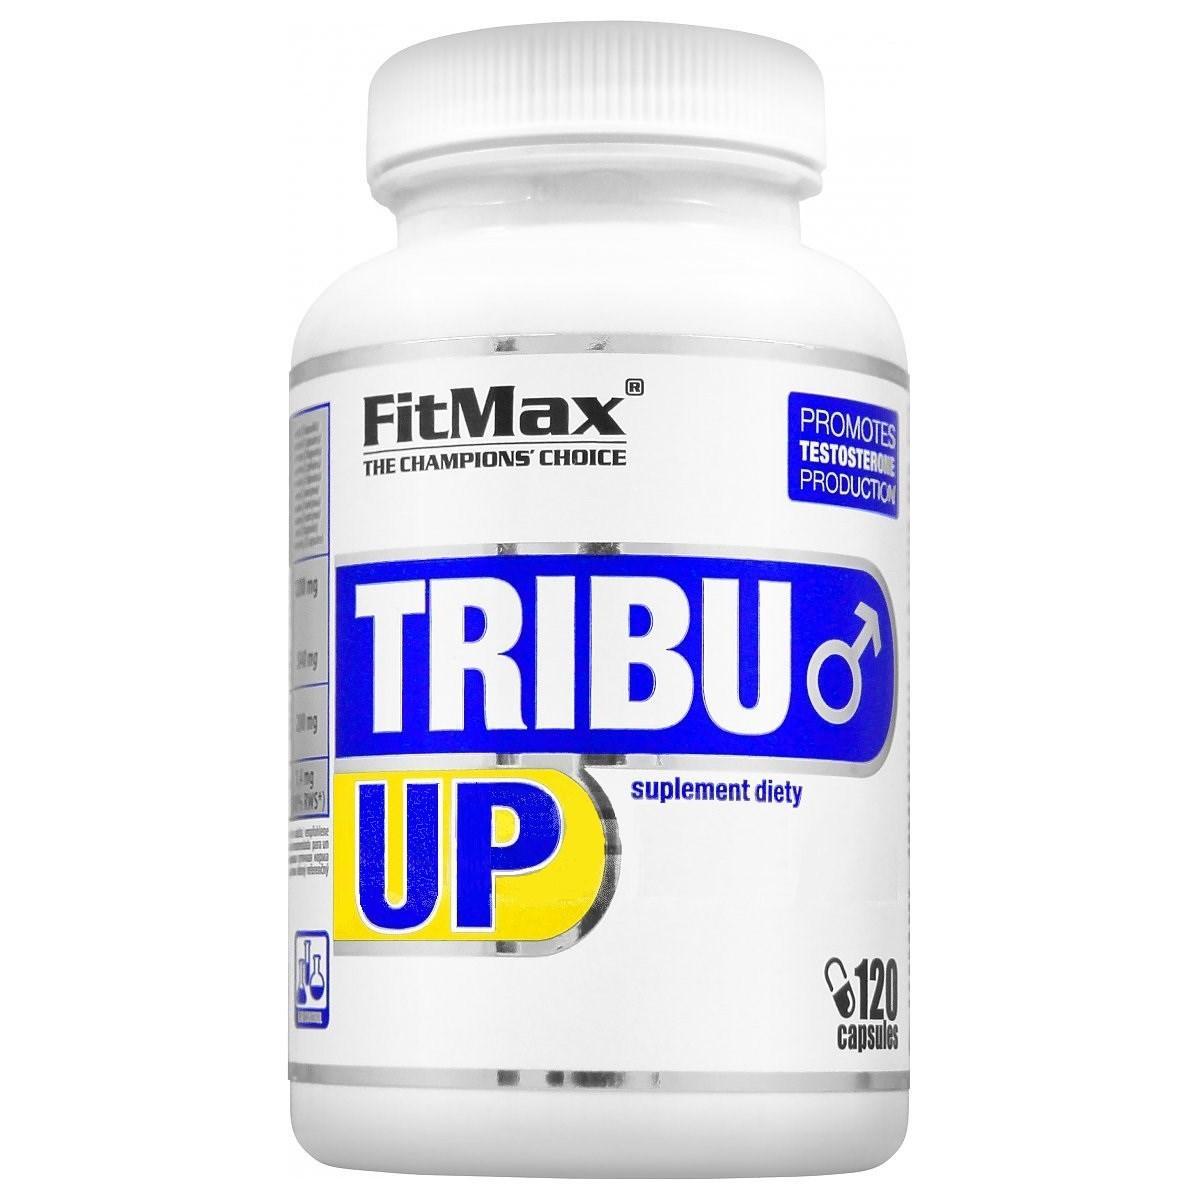 Бустер тестостерону Трибулус В Tribu Up 120 caps